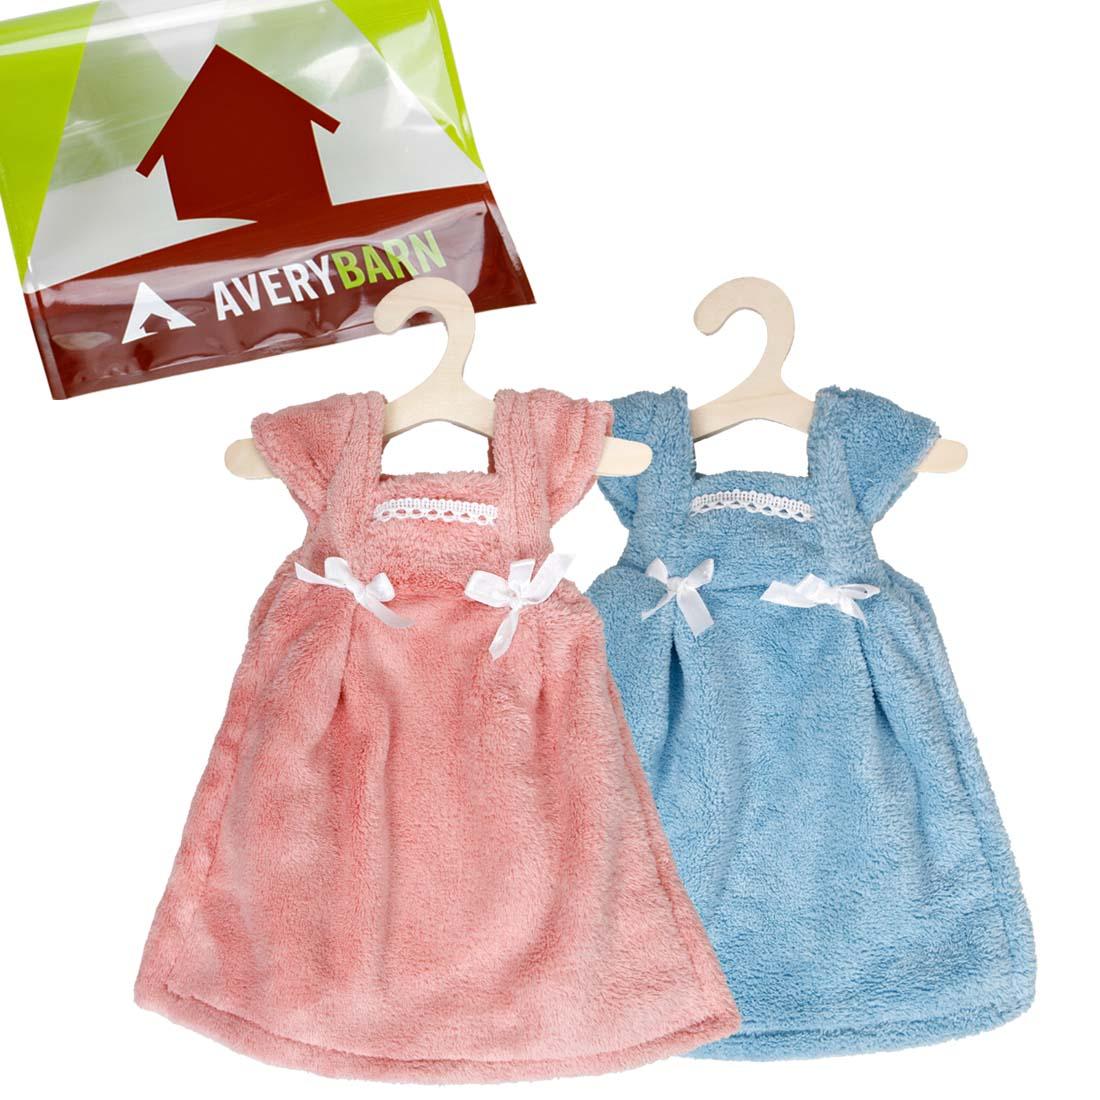 Avery Barn Various Design Mini Dress Soft Bathroom Kitchen ...